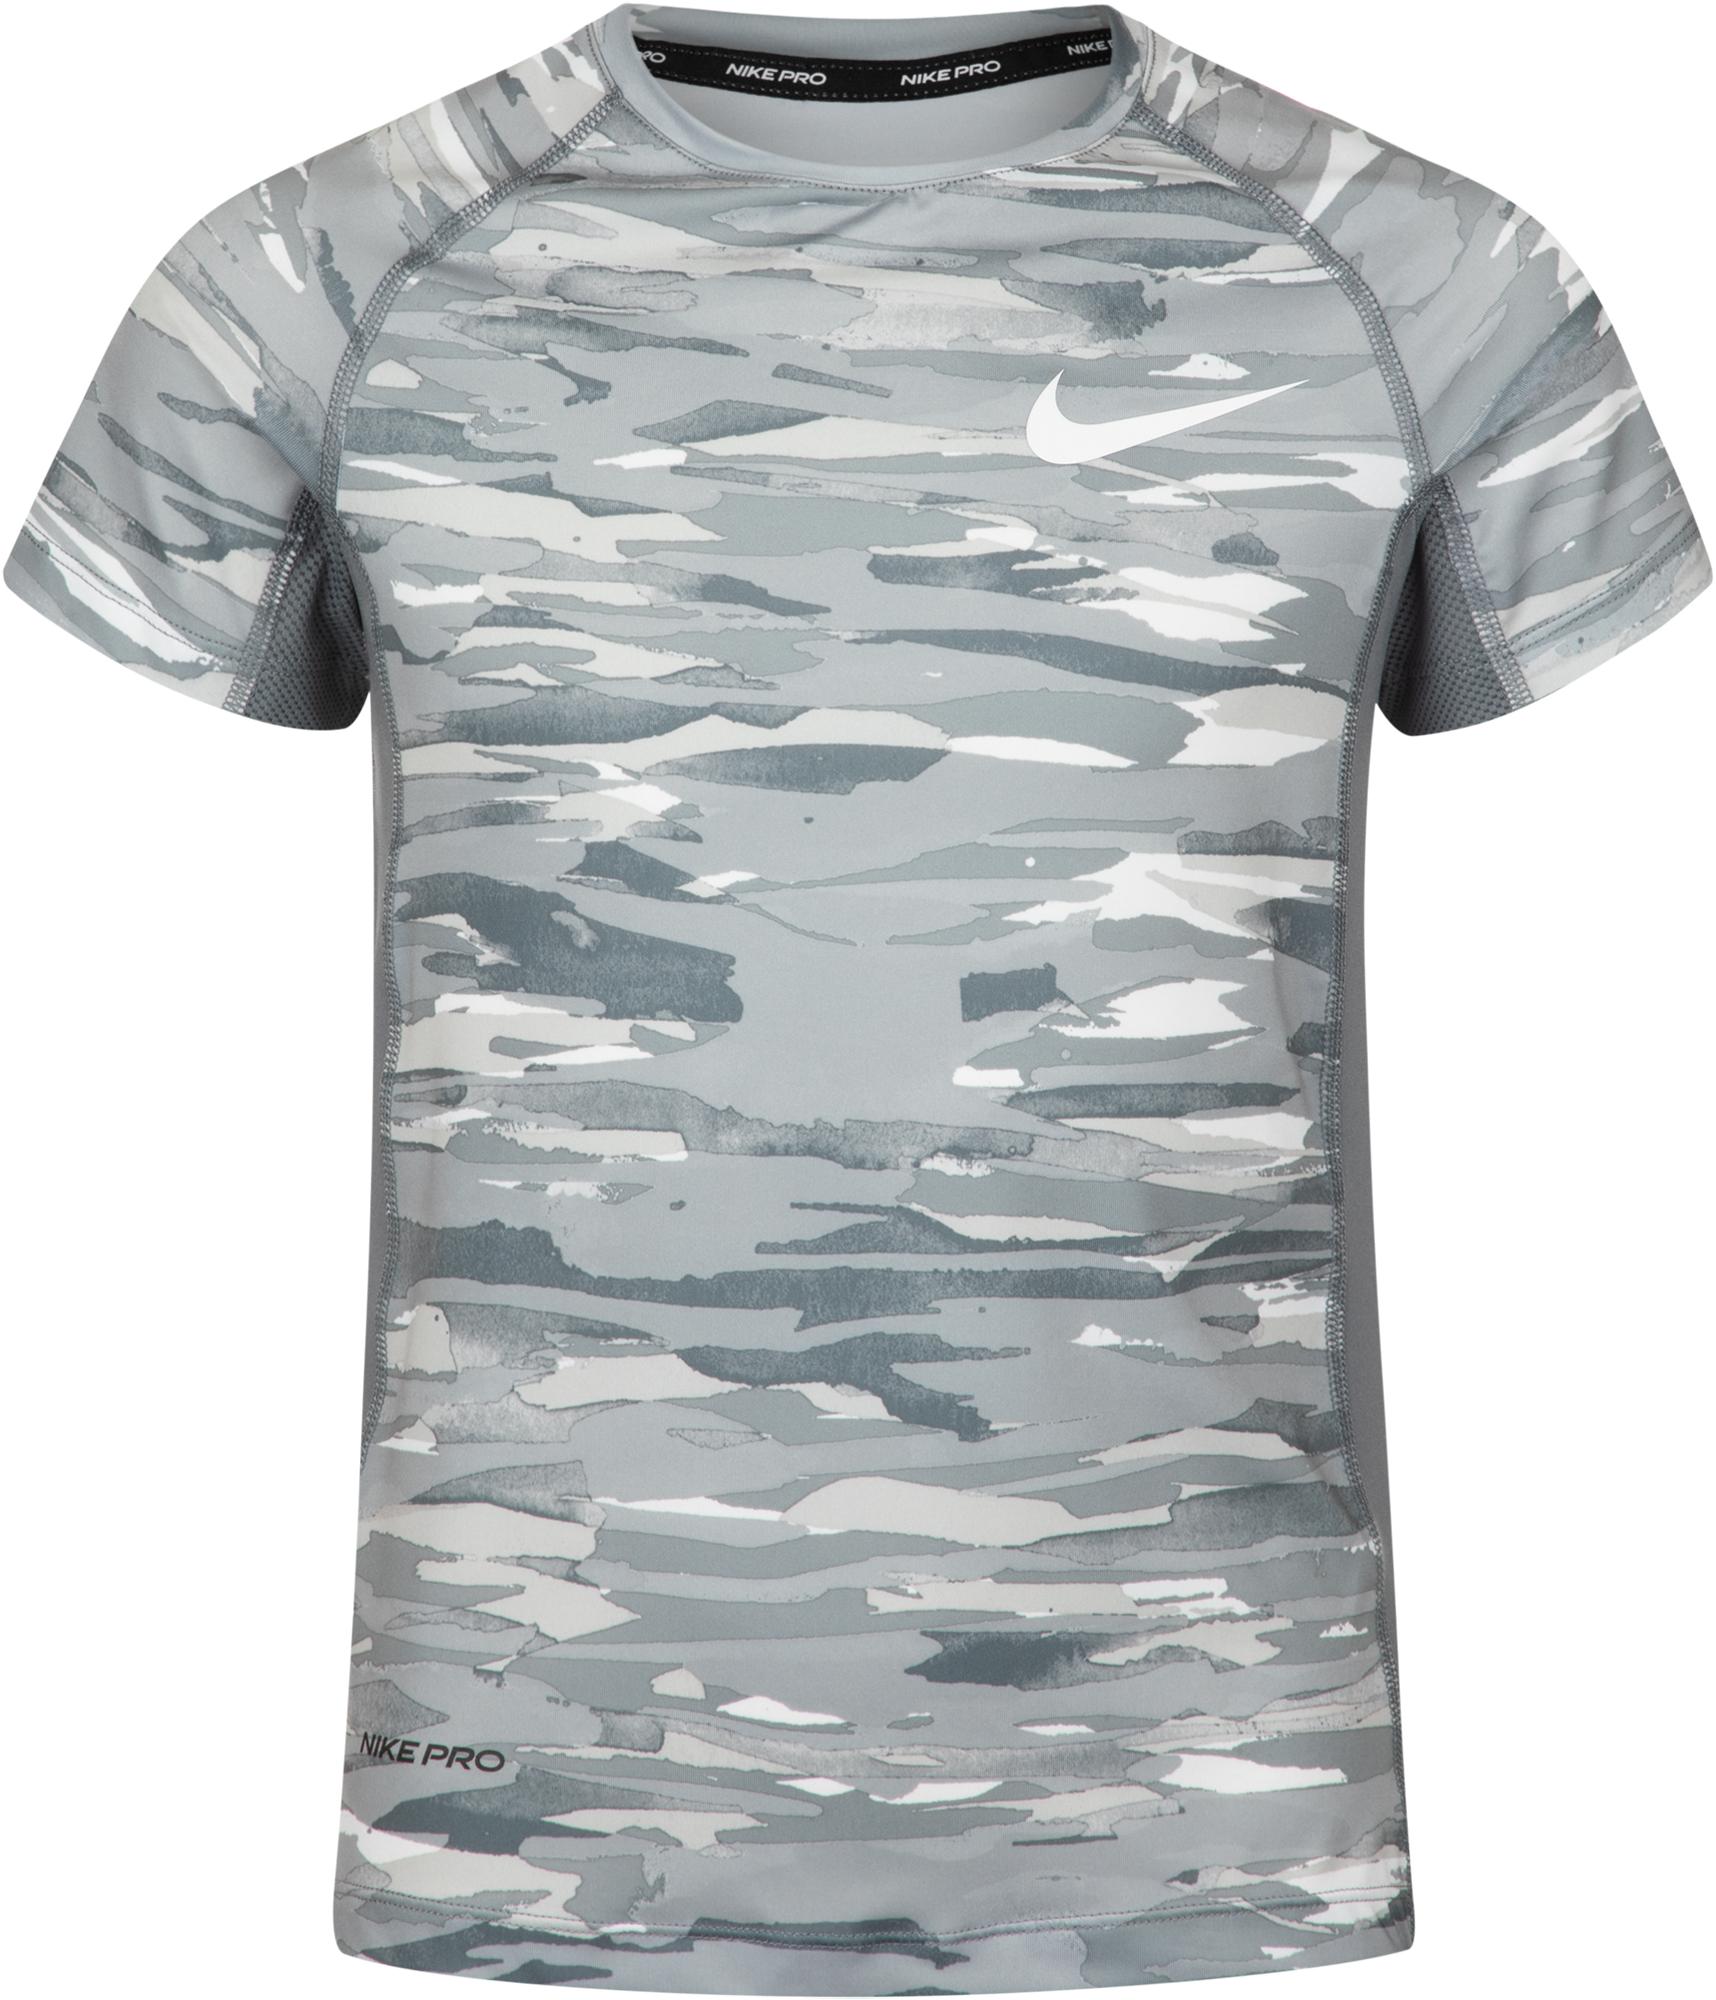 Nike Футболка для мальчиков Nike Pro, размер 137-147 nike футболка для мальчиков nike geo basketball